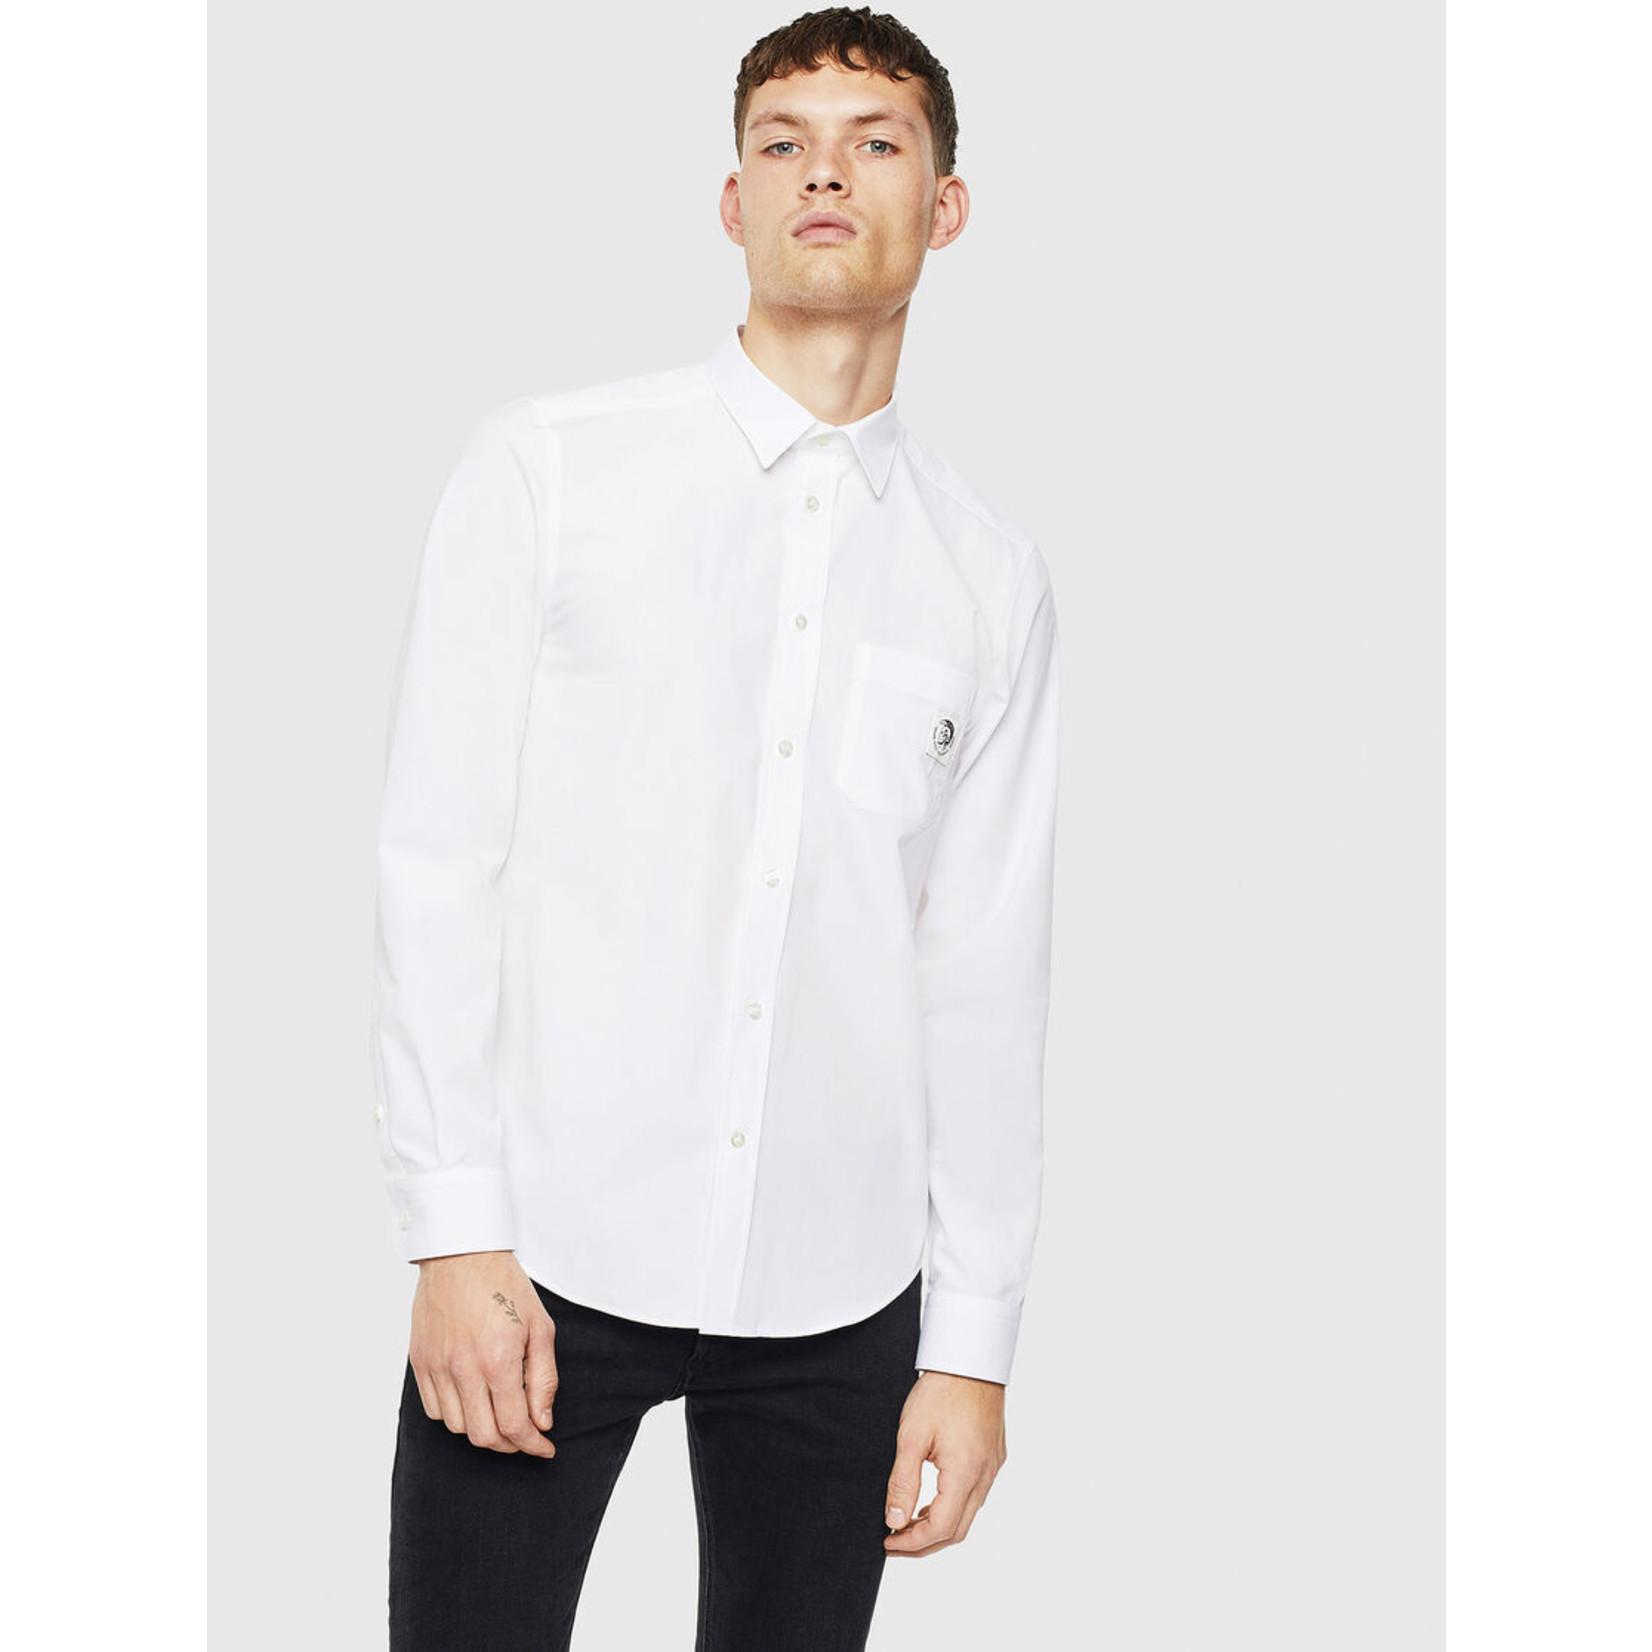 DIESEL Diesel - Men's Dress Shirt - S-Bill